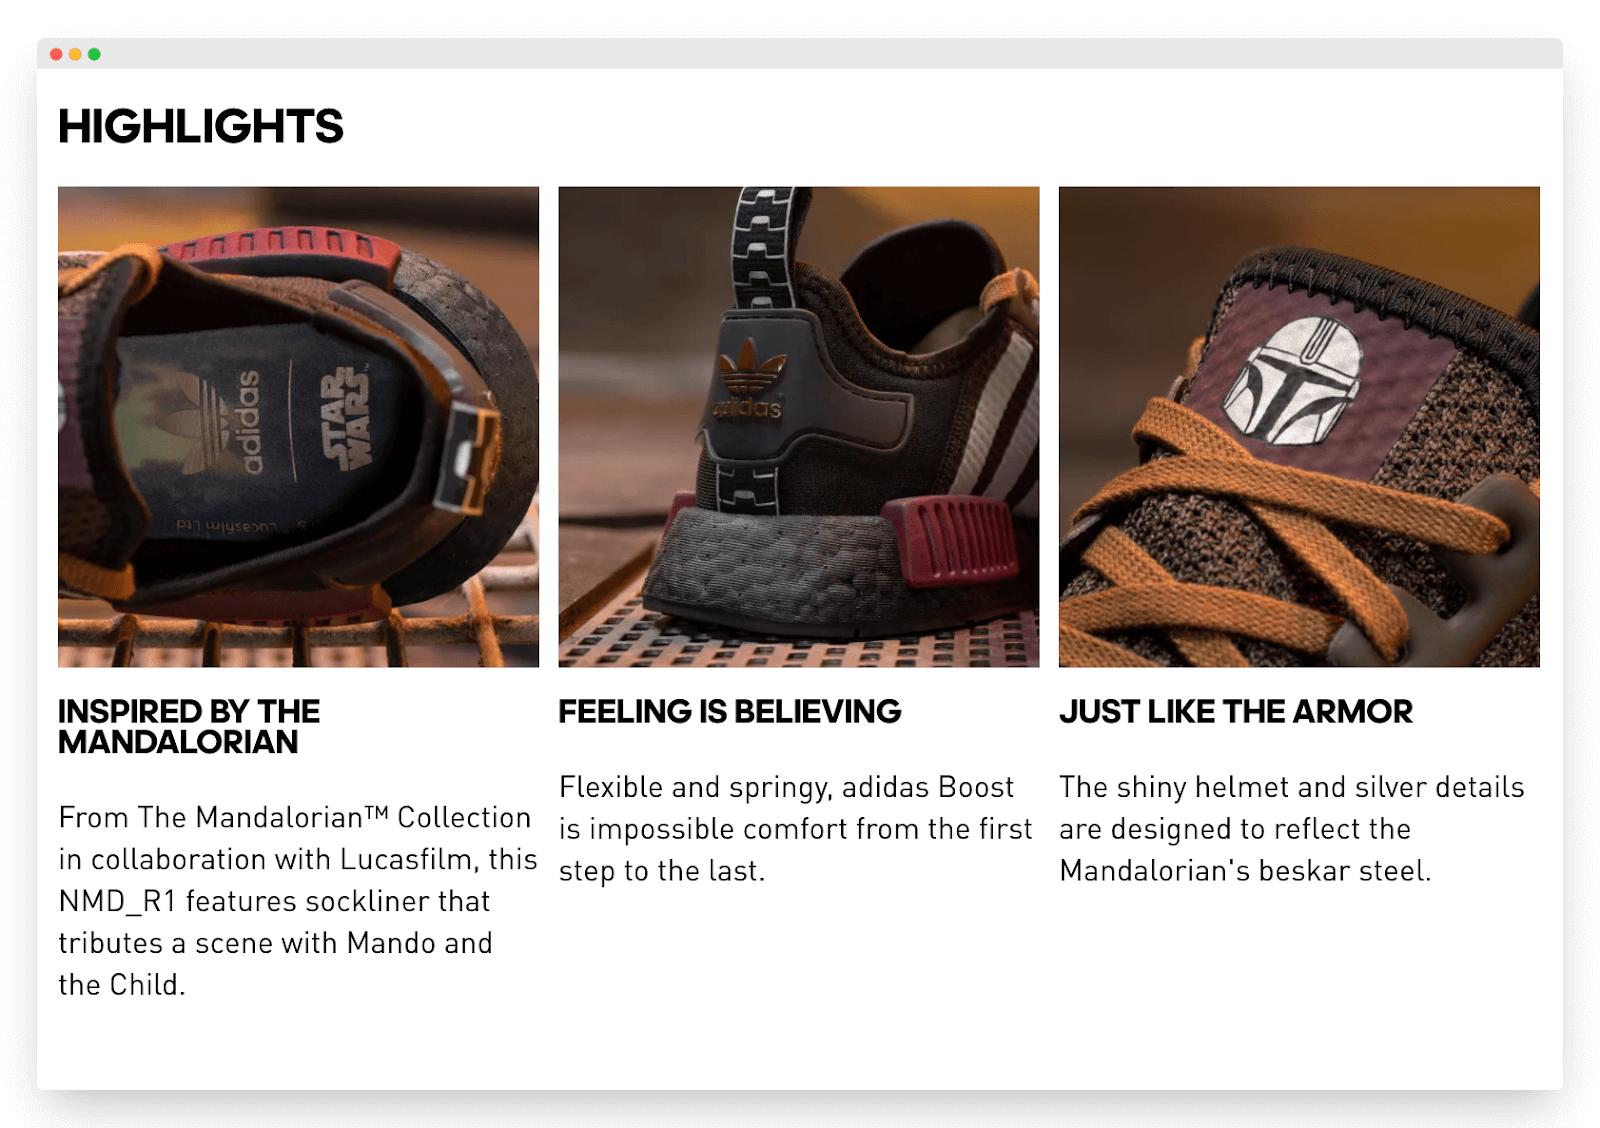 Adidas limited edition Mandalorian merchandise